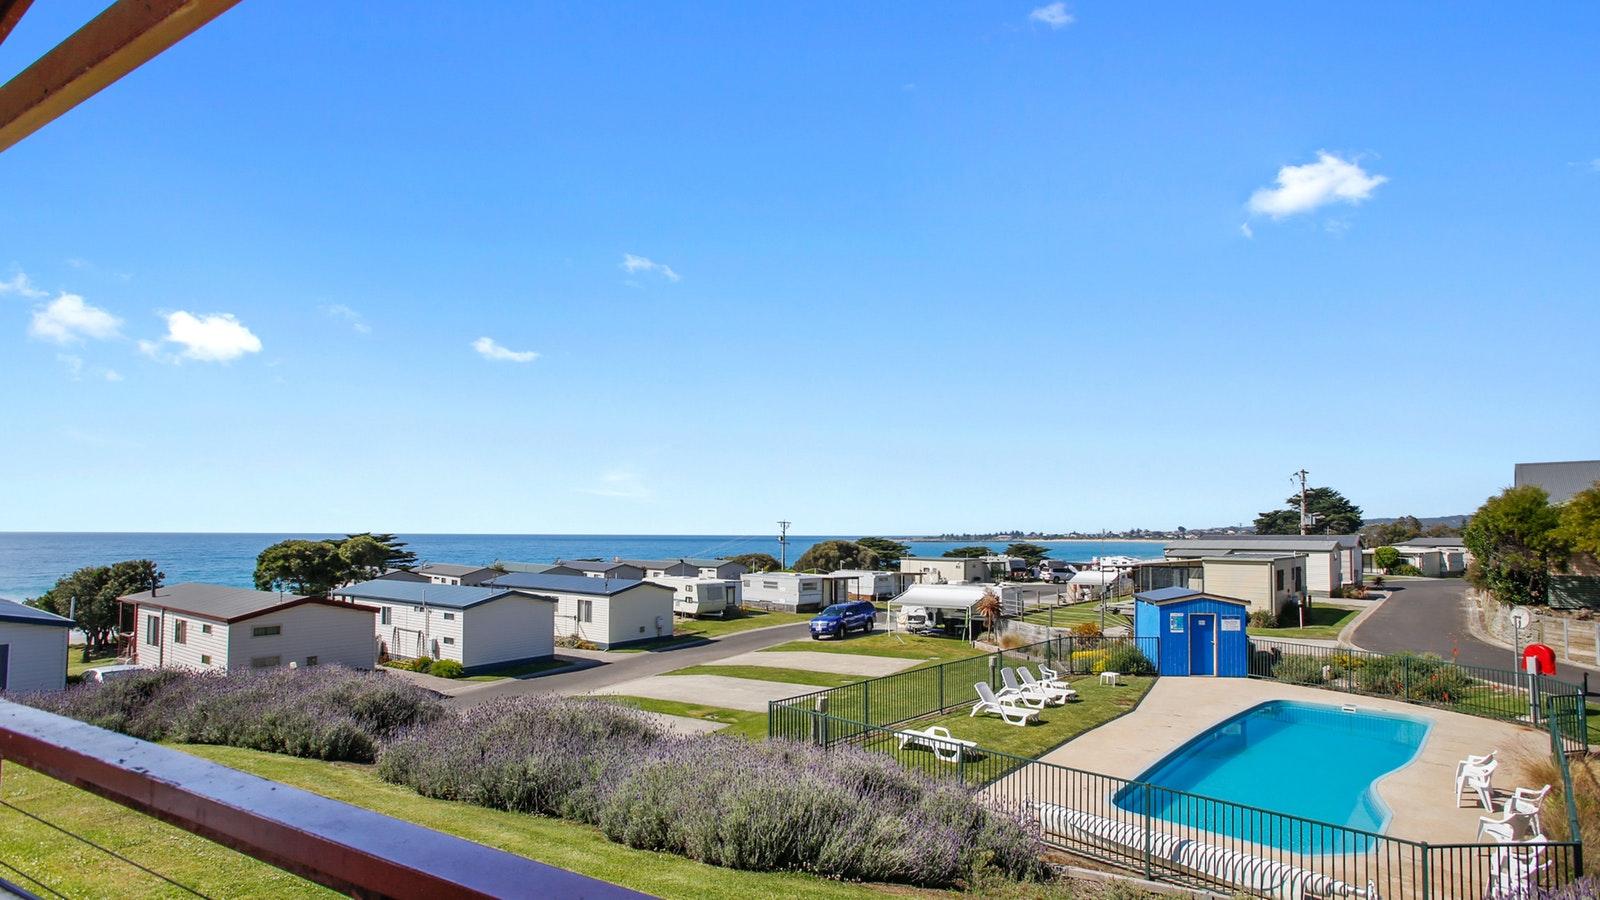 BIG4 Apollo Bay Pisces Holiday Park